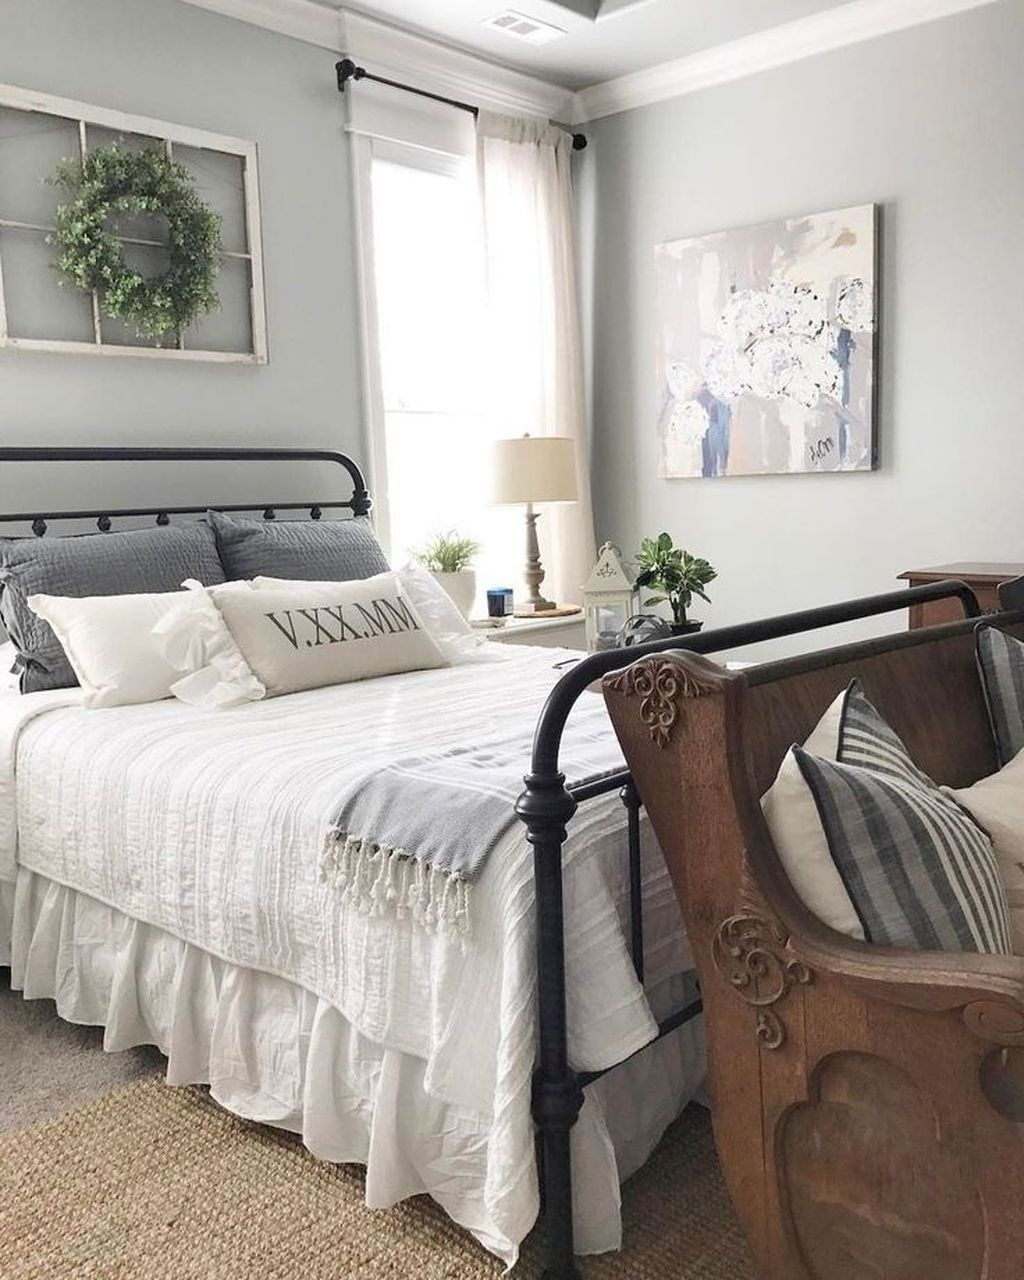 50 Cozy Farmhouse Master Bedroom Remodel Ideas: 50 Elegant Farmhouse Bedroom Decor Ideas